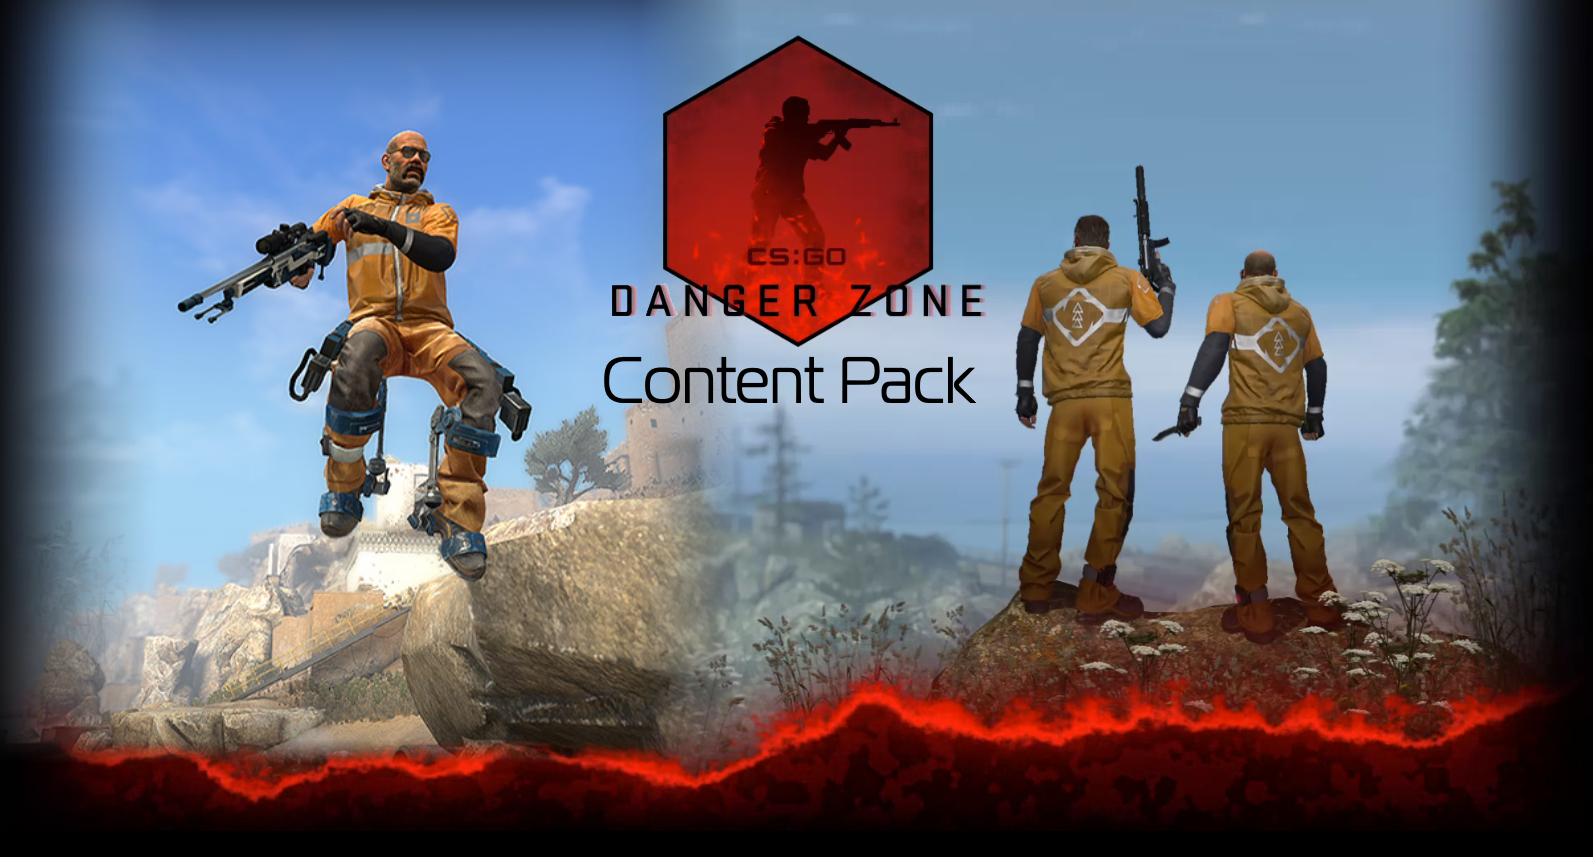 Masterskaya Steam Danger Zone Content Pack Counter Strike Global Offensive